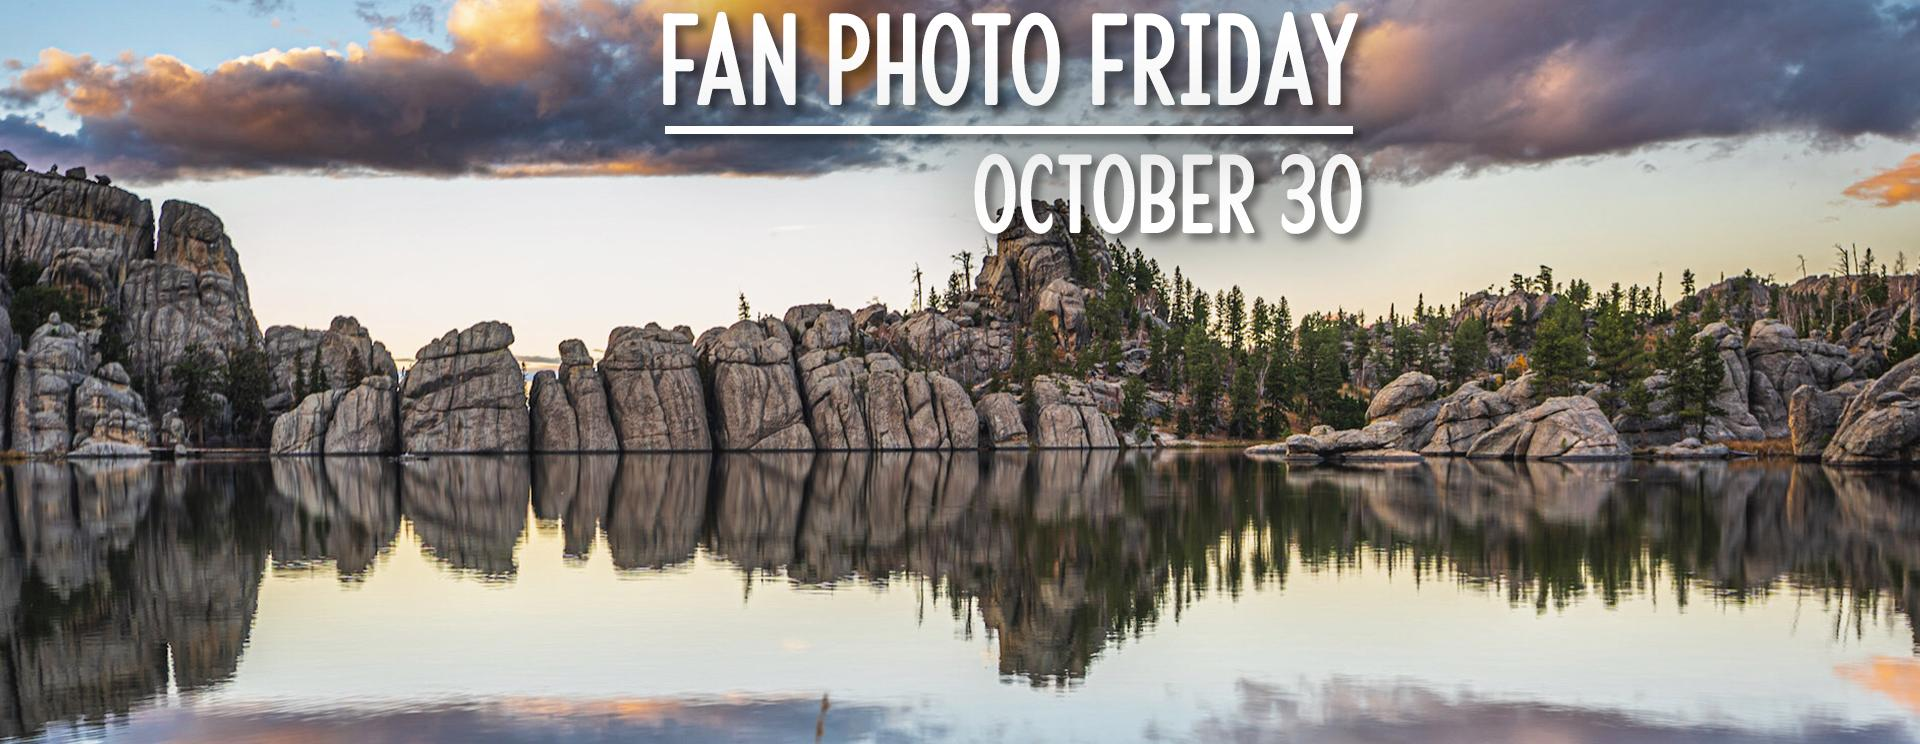 Fan Photo Friday | October 30, 2020